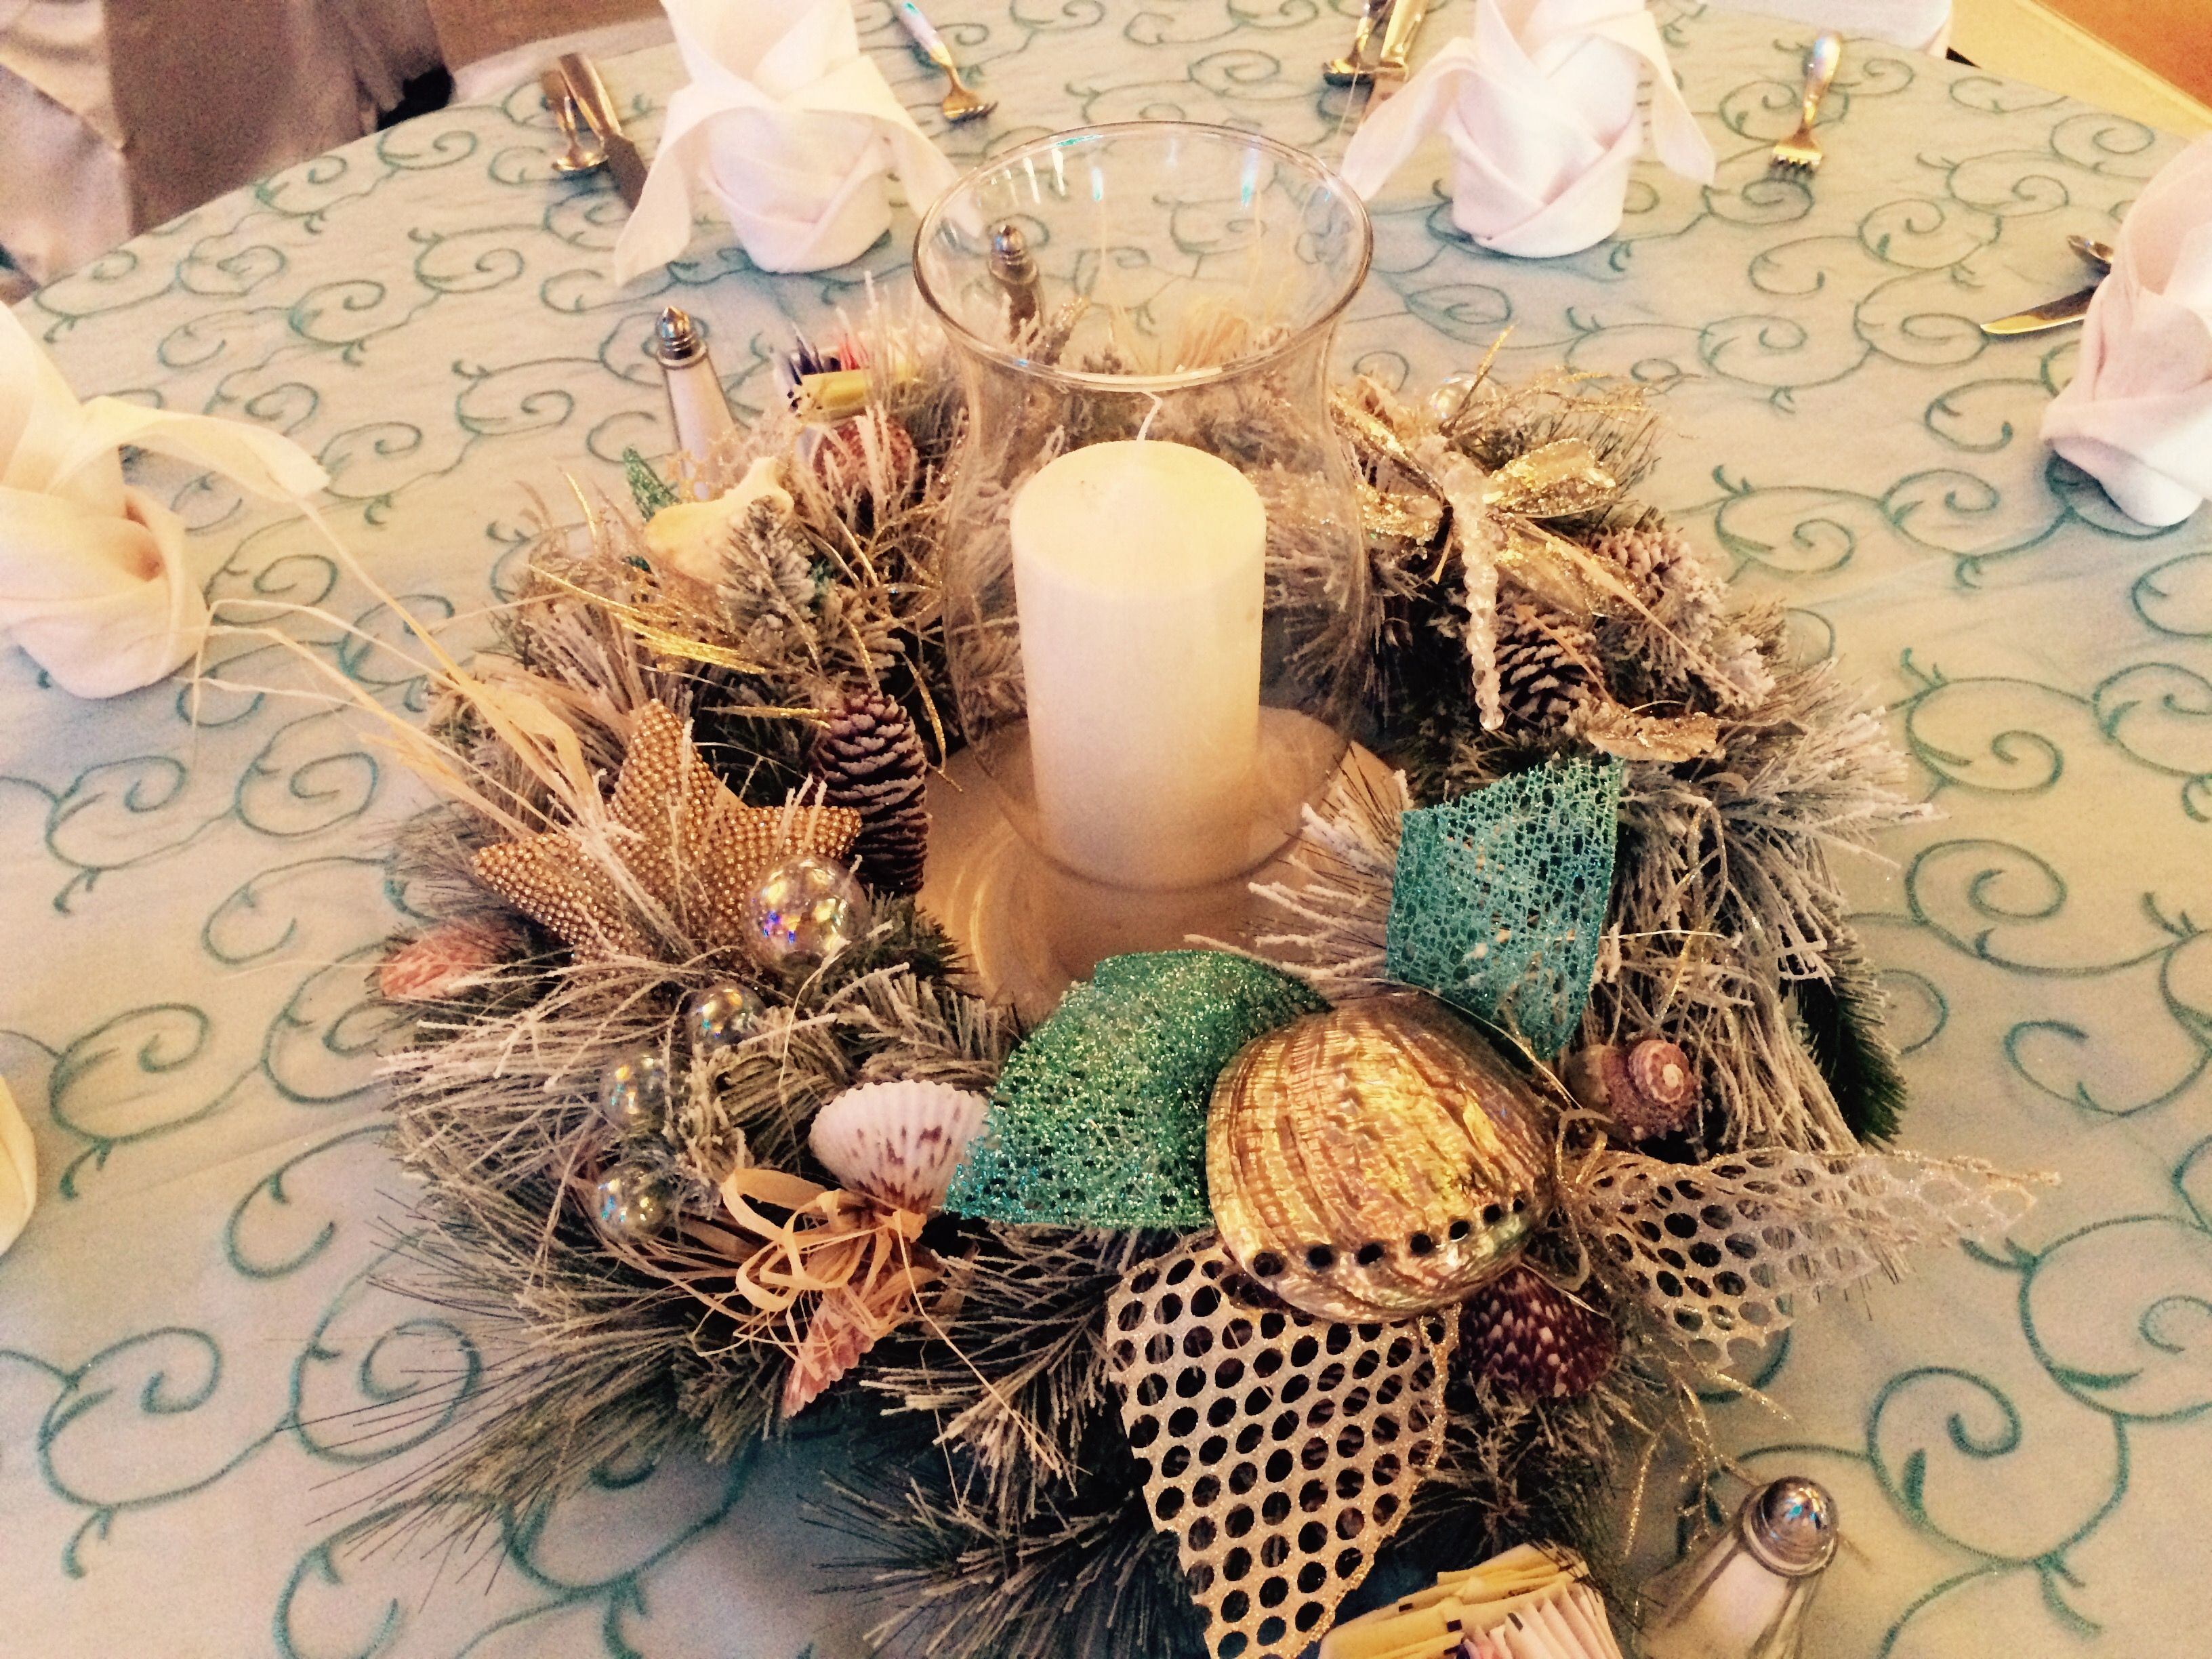 Coastal Christmas Reef made by Wanda Fife at Moody Gardens ...